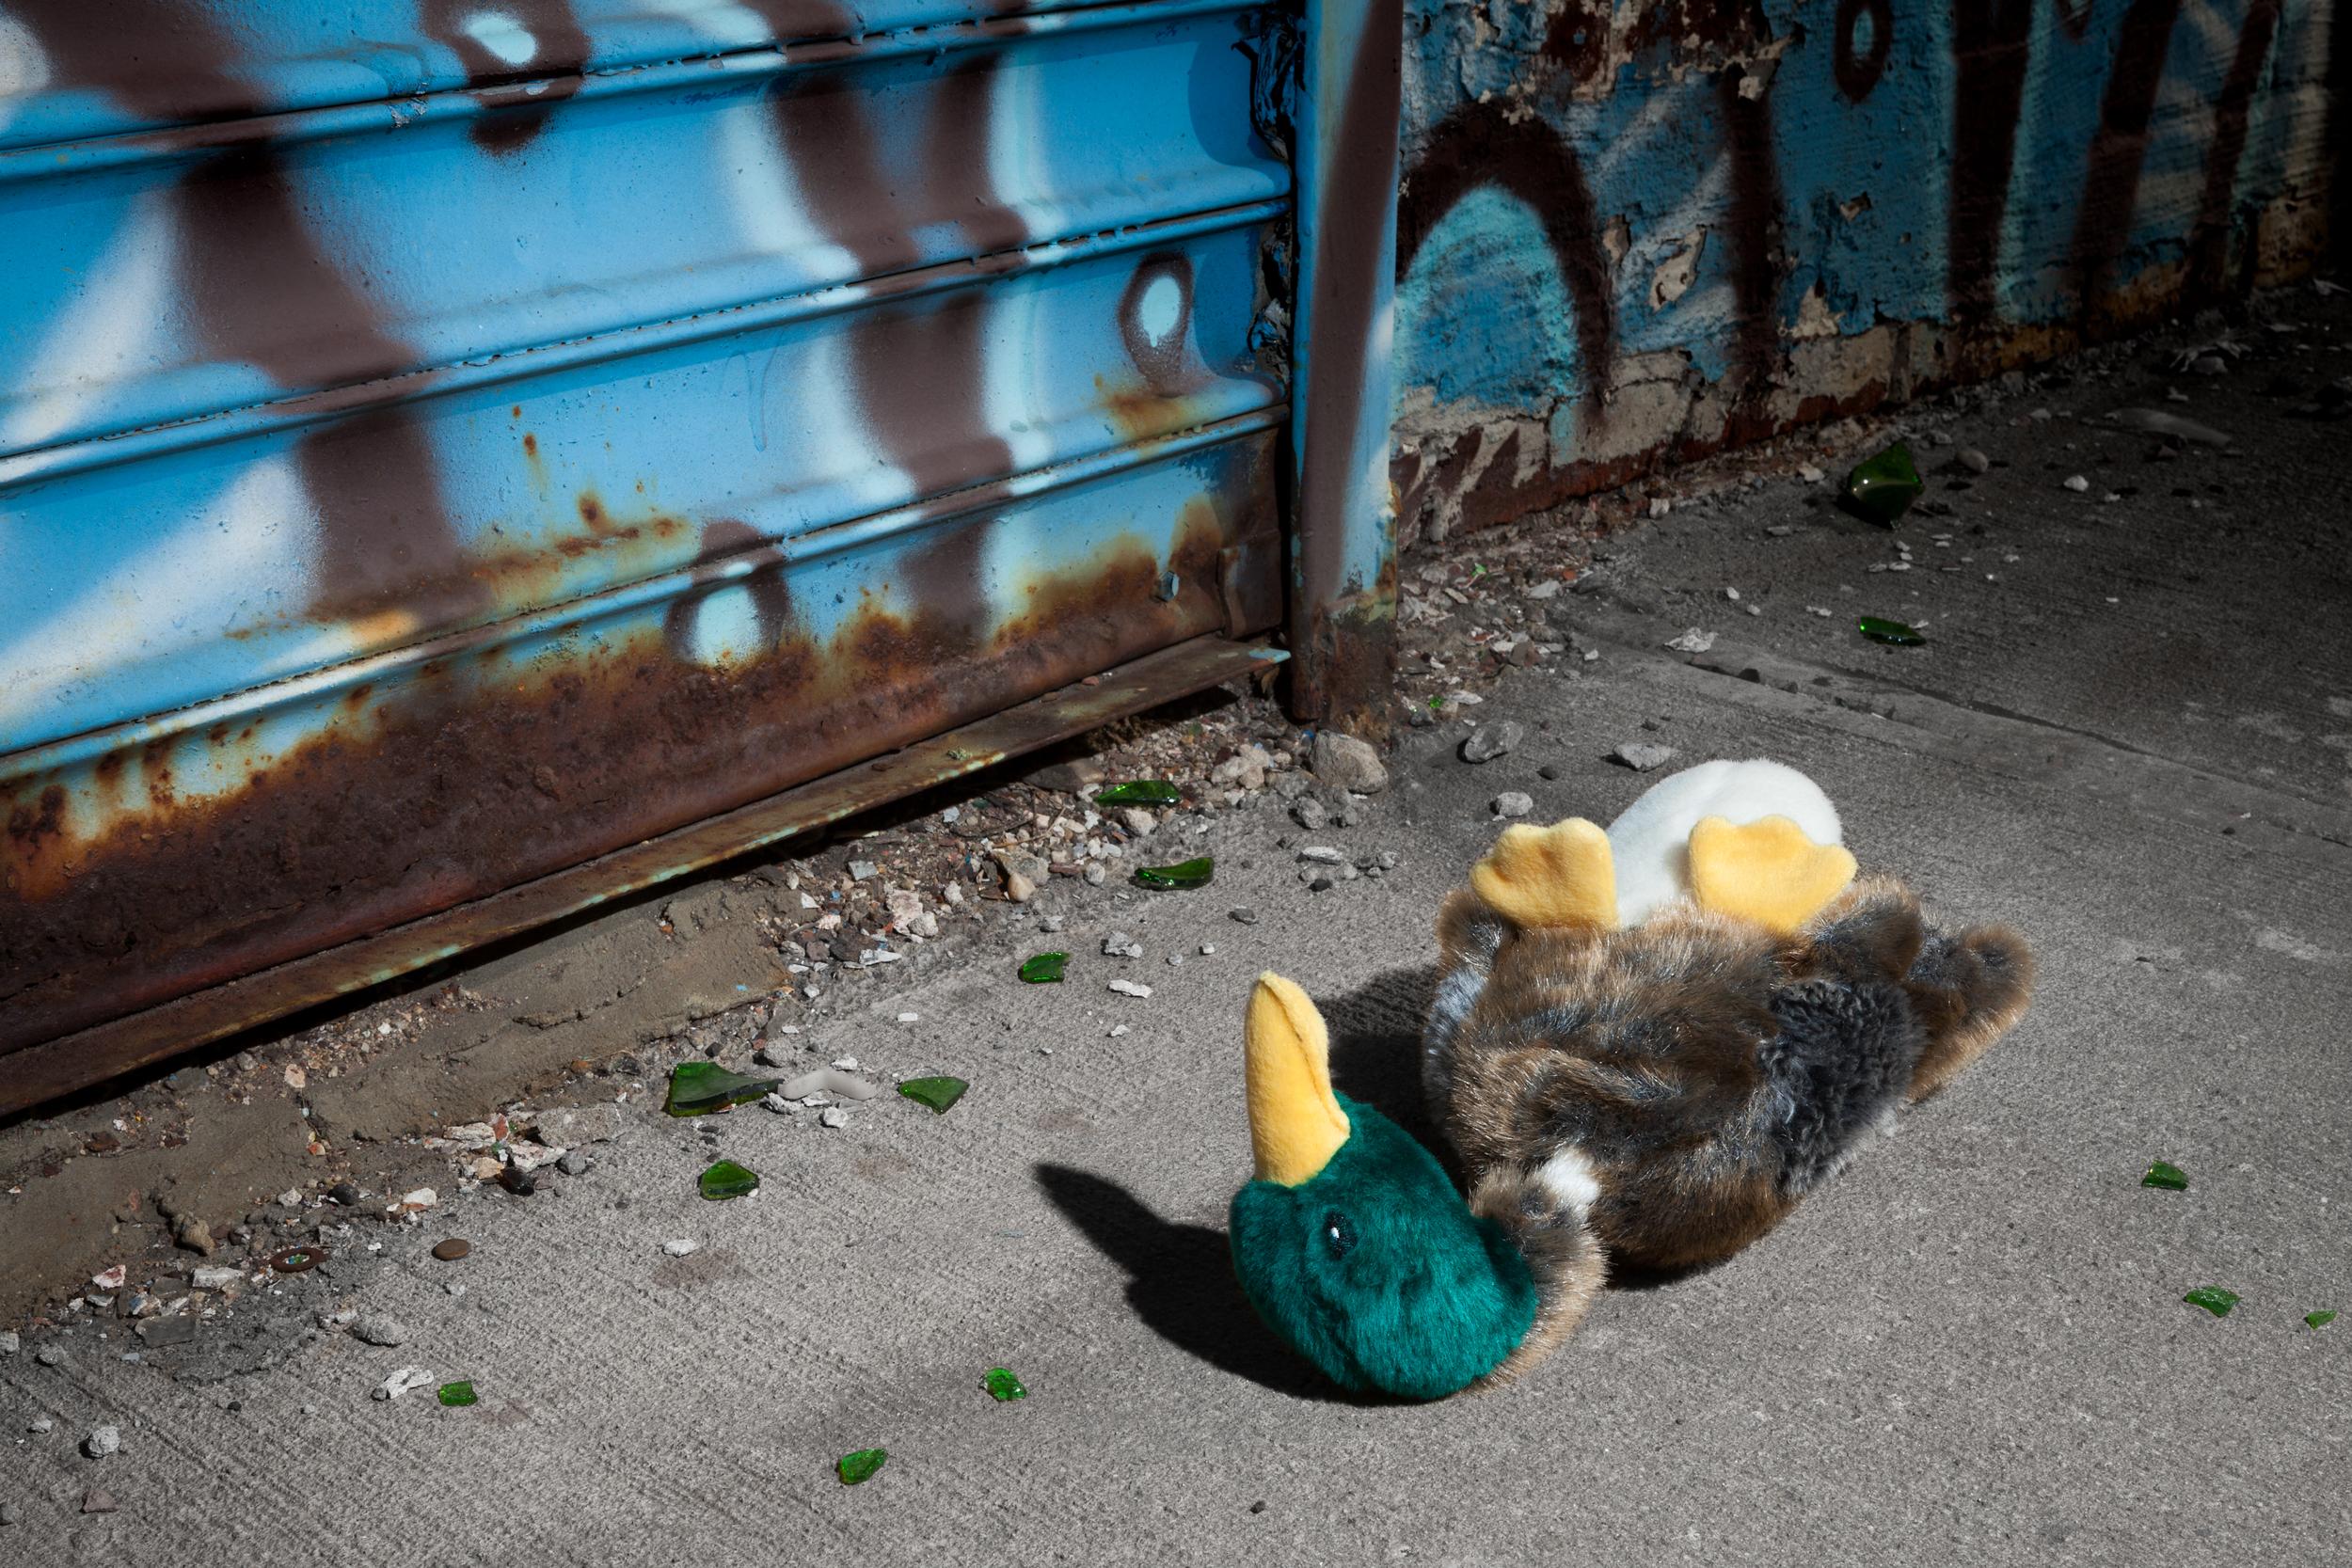 Morbidity & Mortality: Duck